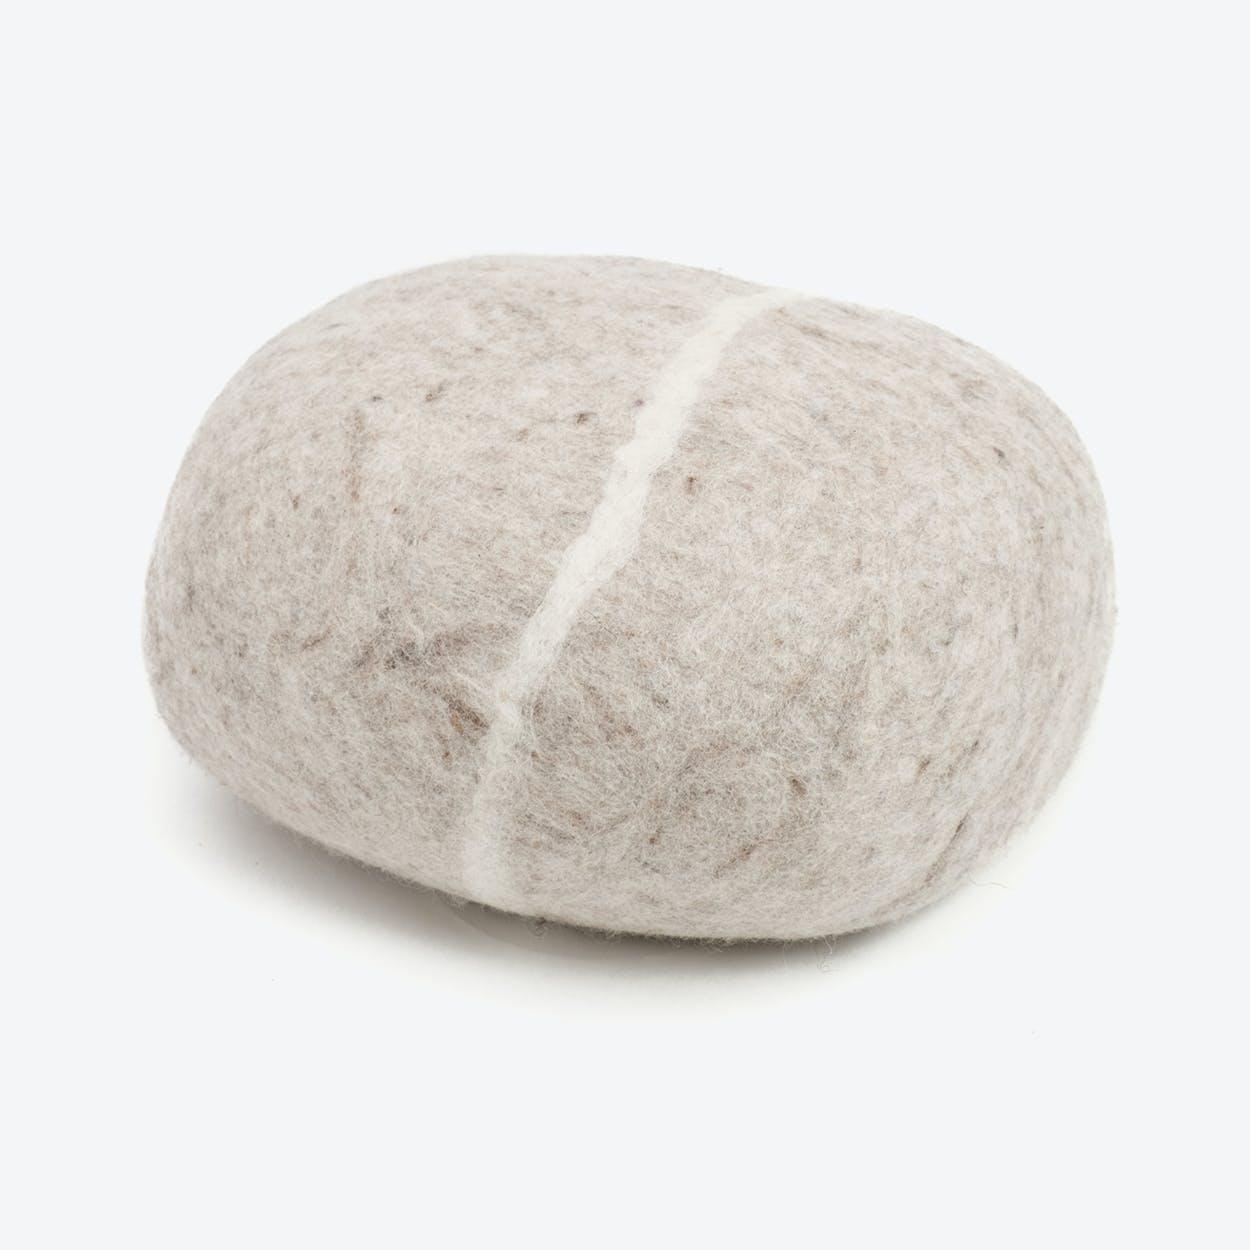 Béla-Felt Stone Sitting Ball in Beige